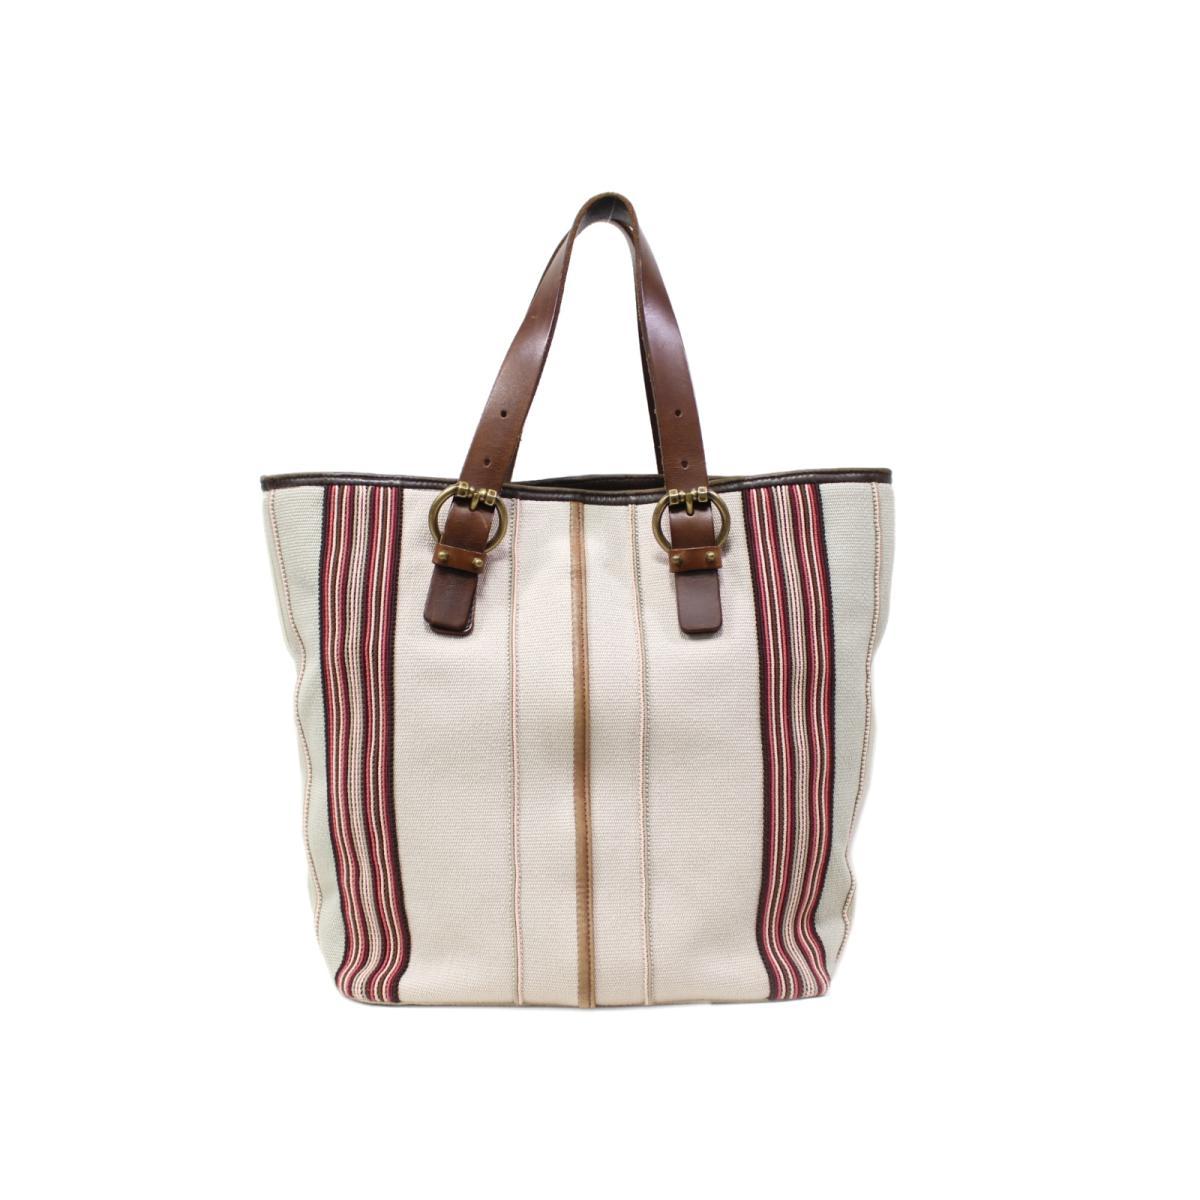 c61d0aa46077 ... ピンク × ブラウン (172028) | BOTTEGA VENETA トートバック トート 肩がけ バッグ バック BAG 鞄 カバン ブランドバッグ  ブランドバック ブランドオフ BRANDOFF